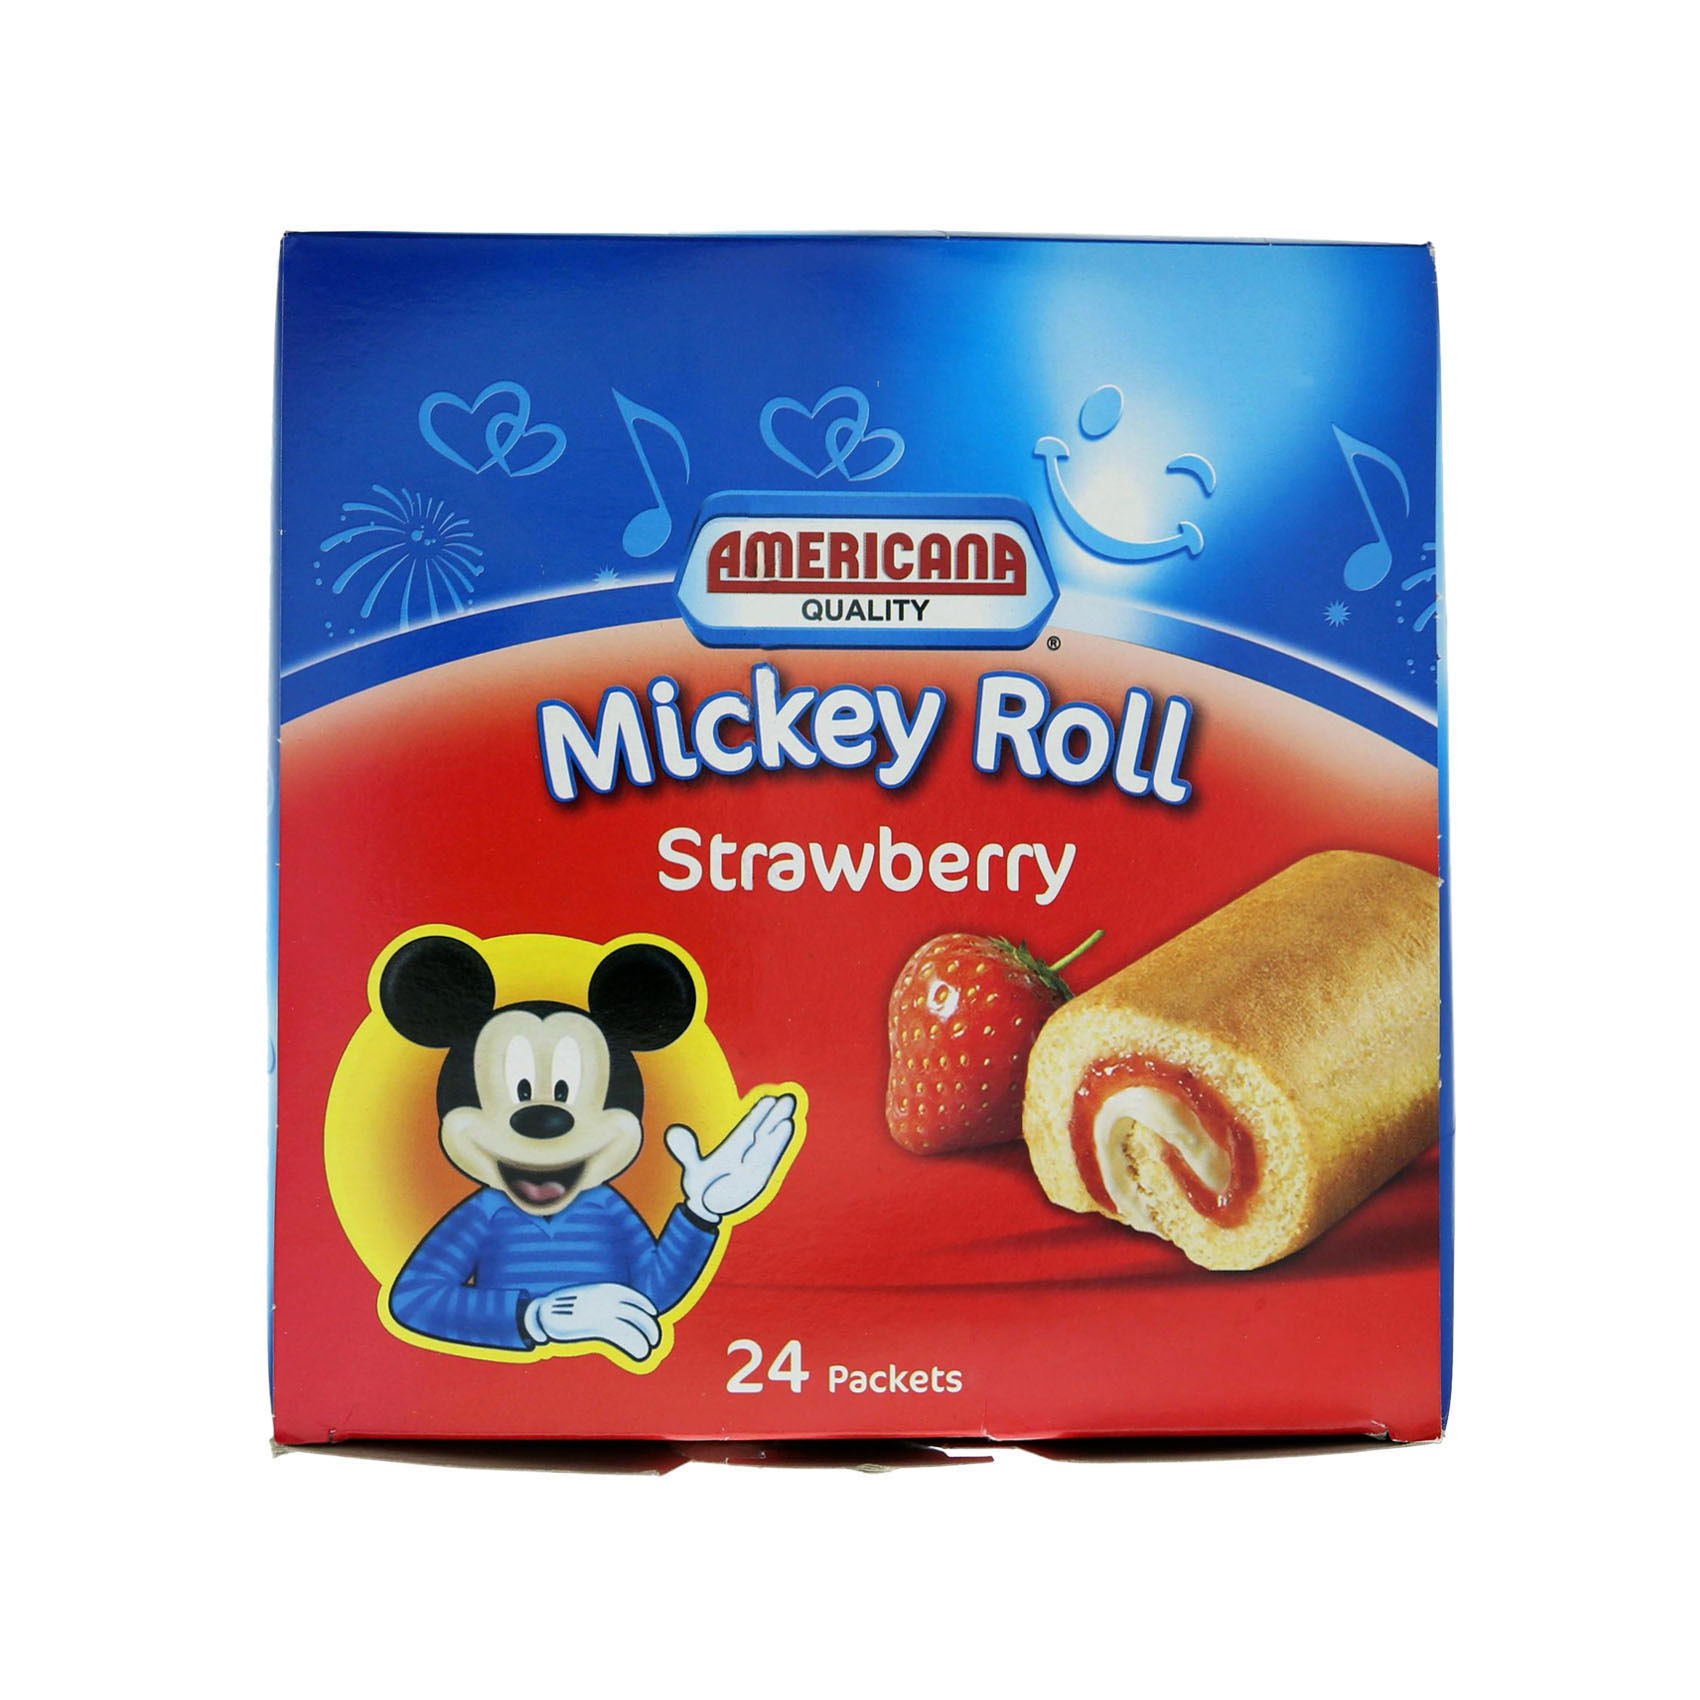 AMERICANA MICKEY ROLL STRAW 20GX24